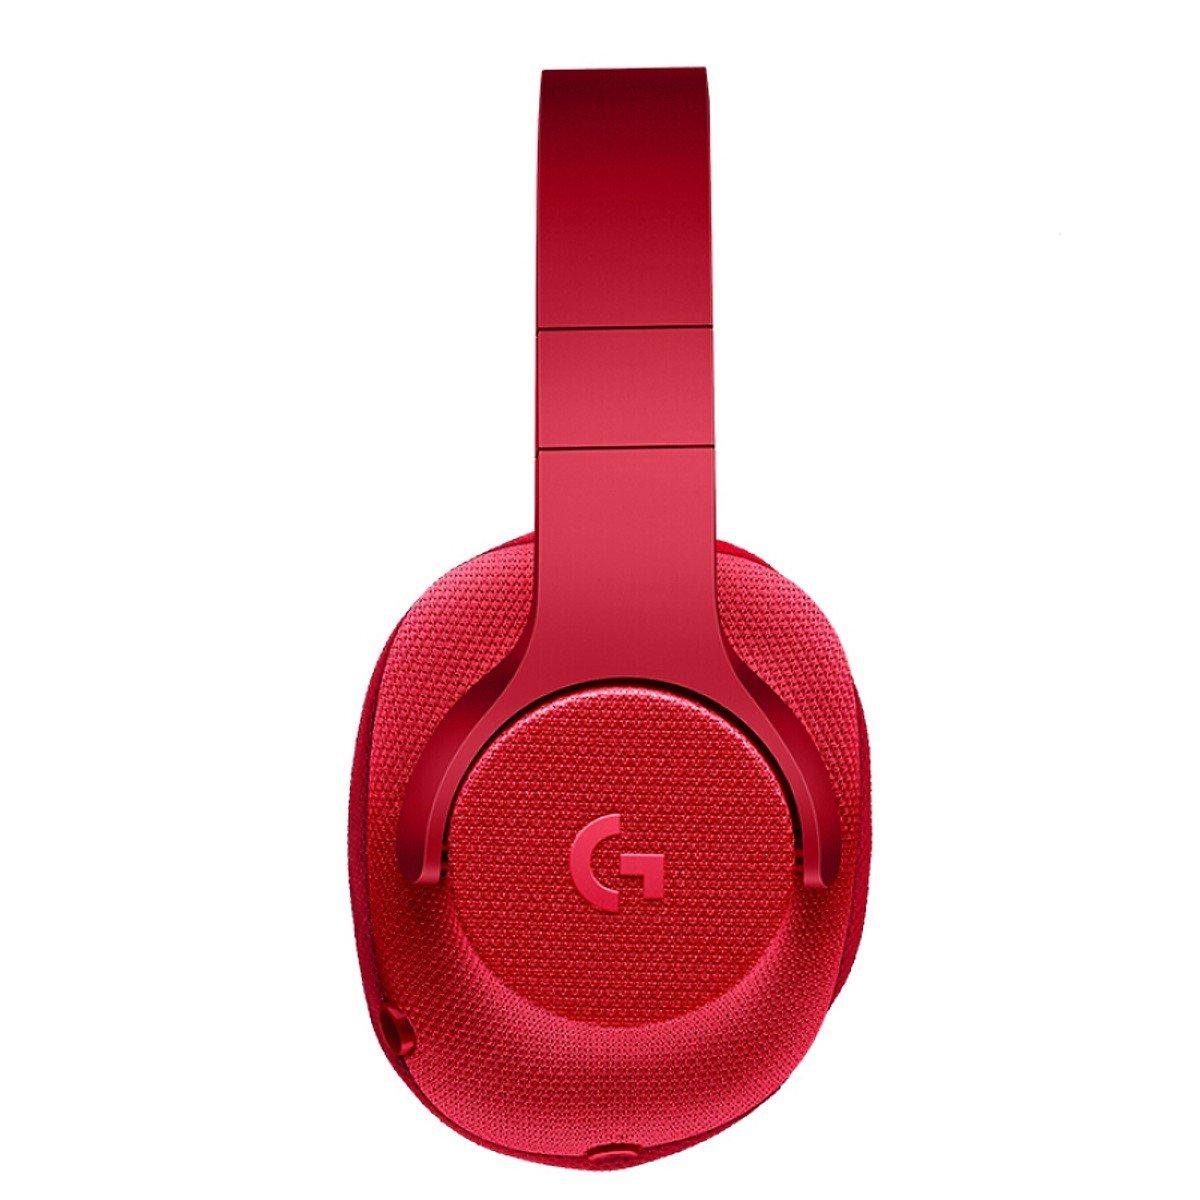 Tai nghe Logitech G433 Red